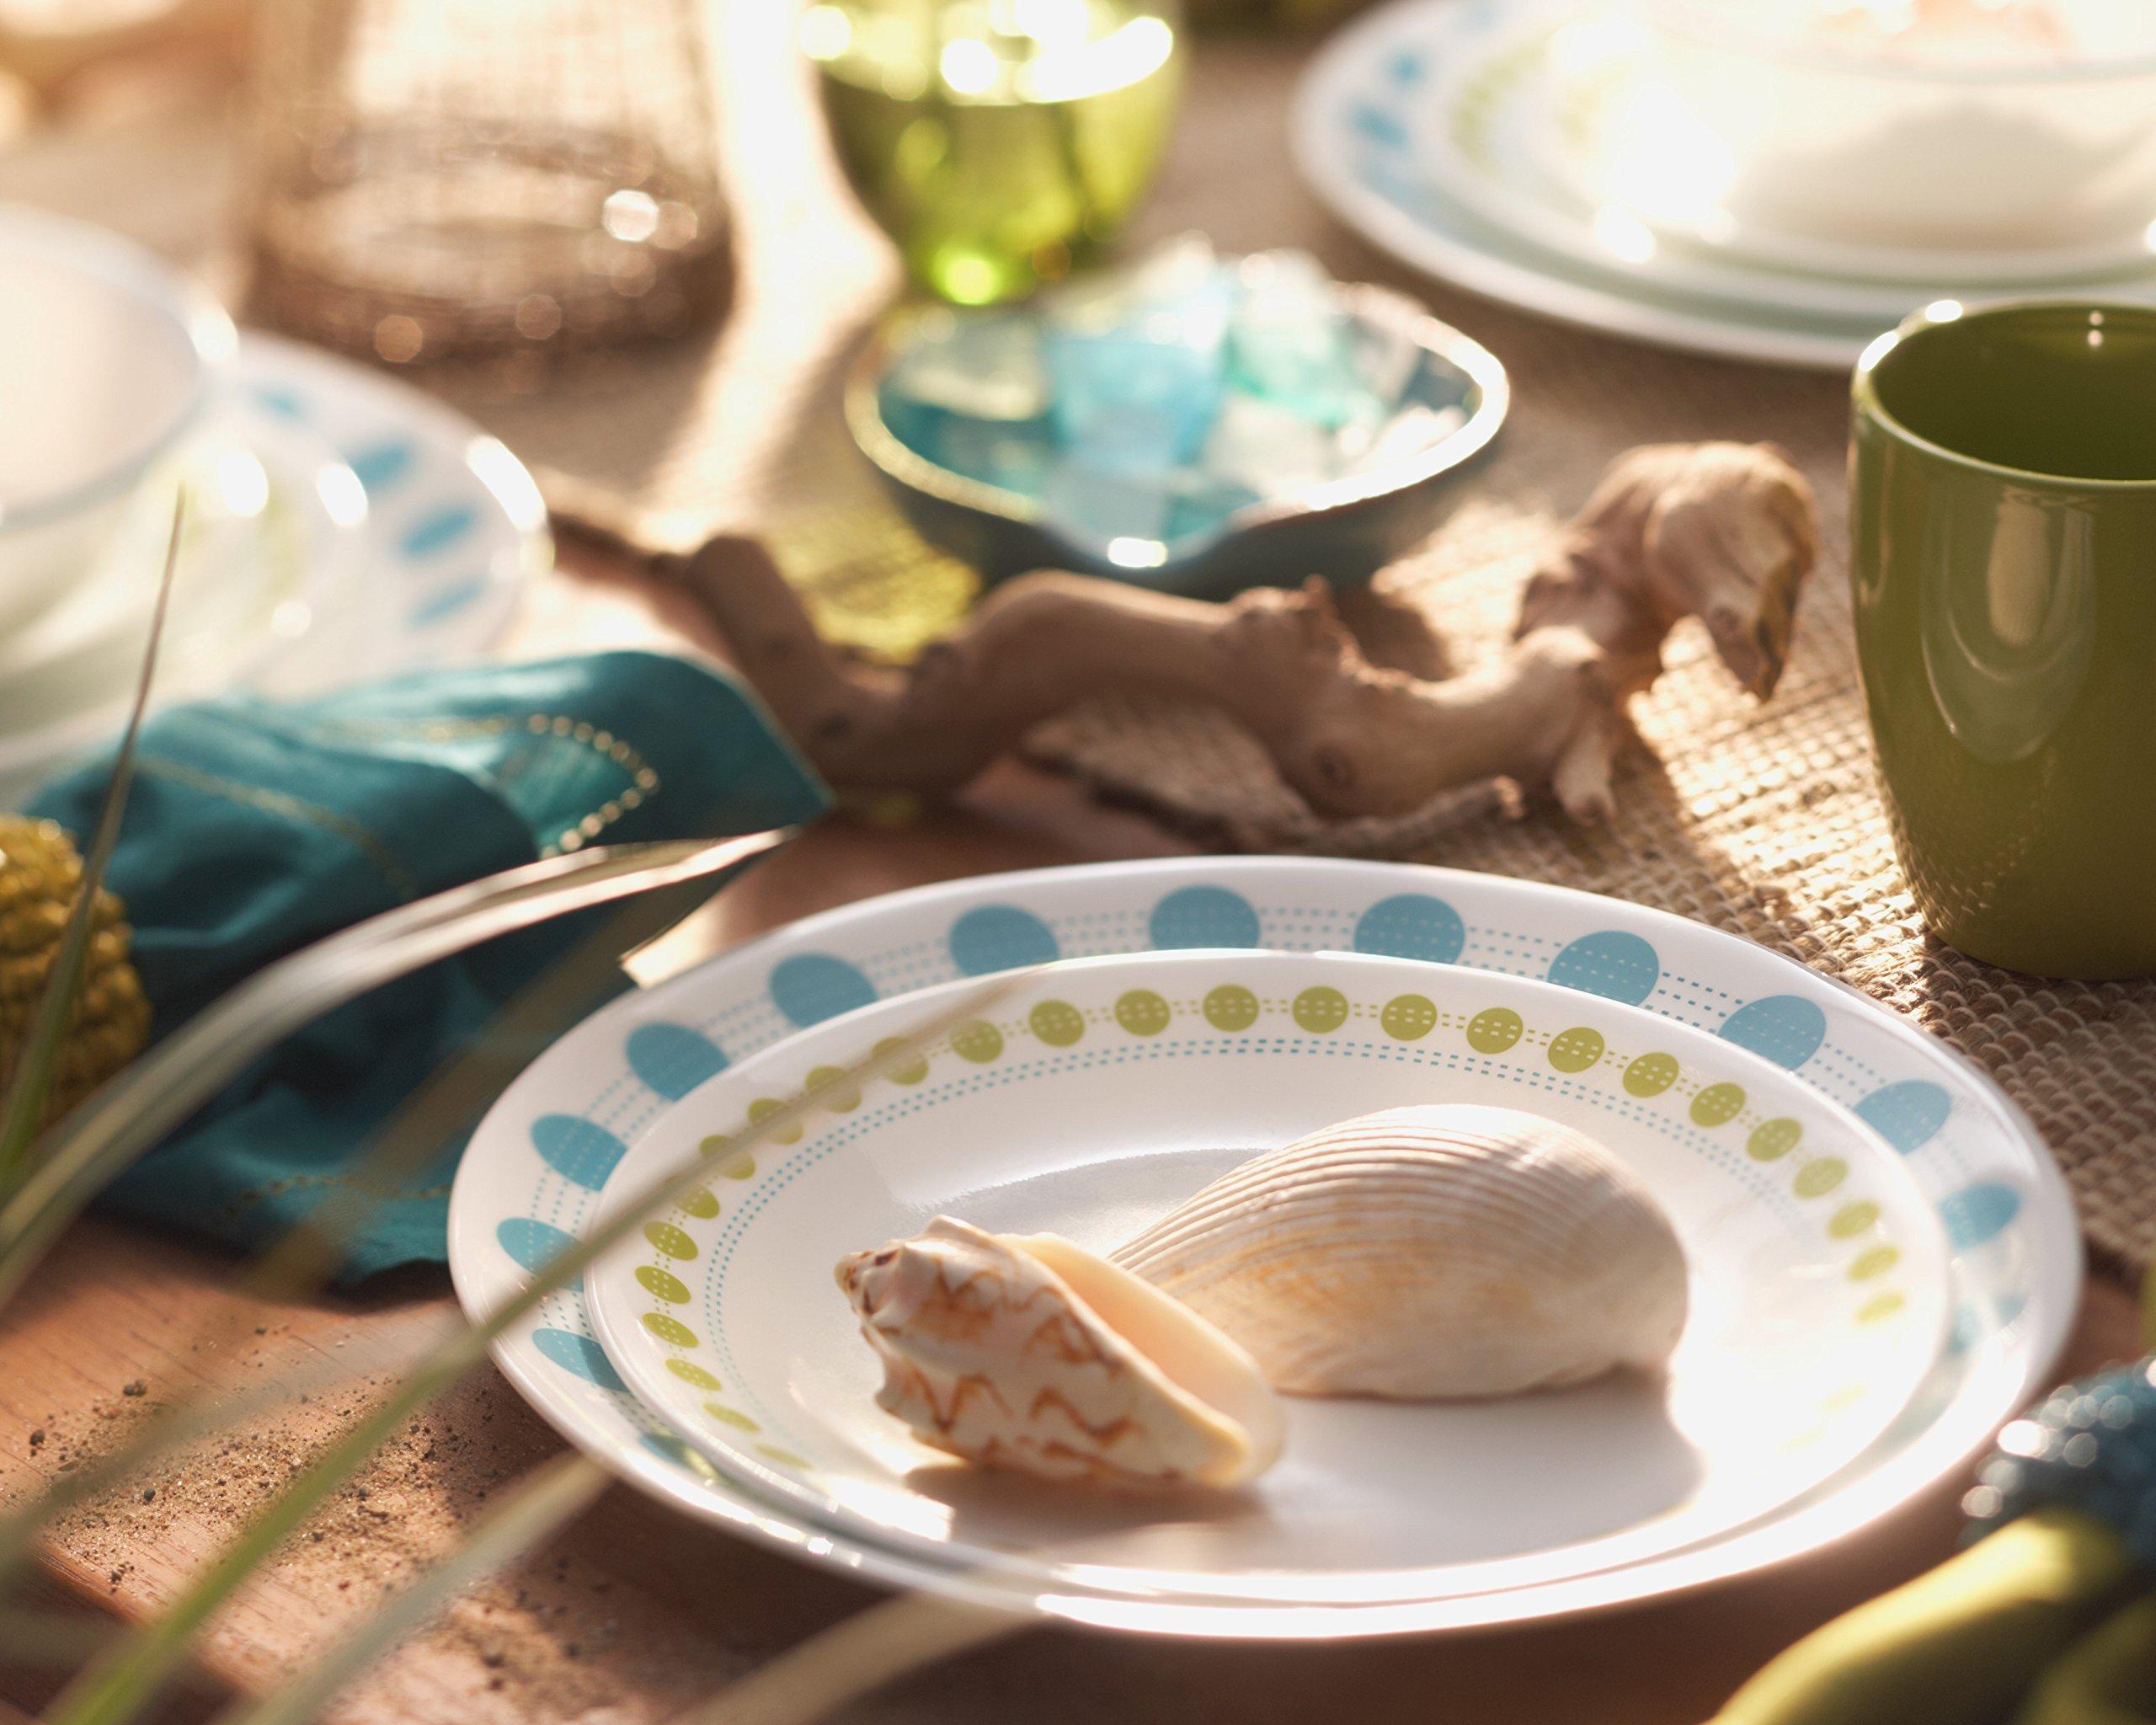 Corelle 16 Piece Charming Hardy Stoneware Livingware Dinnerware Set, Green/Blue Pattern